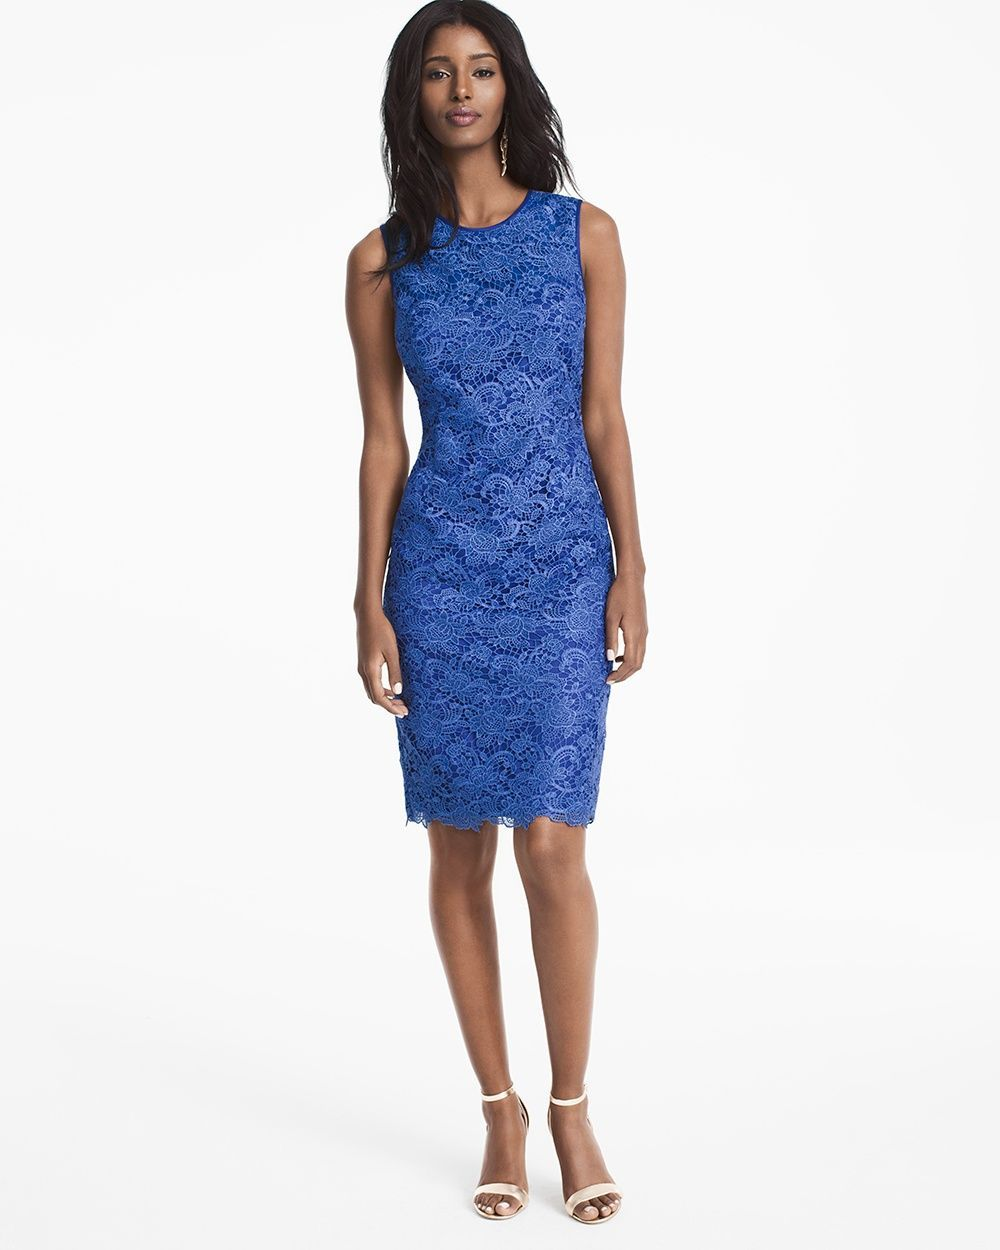 Women S Sleeveless Lace Sheath Dress By Whbm Products